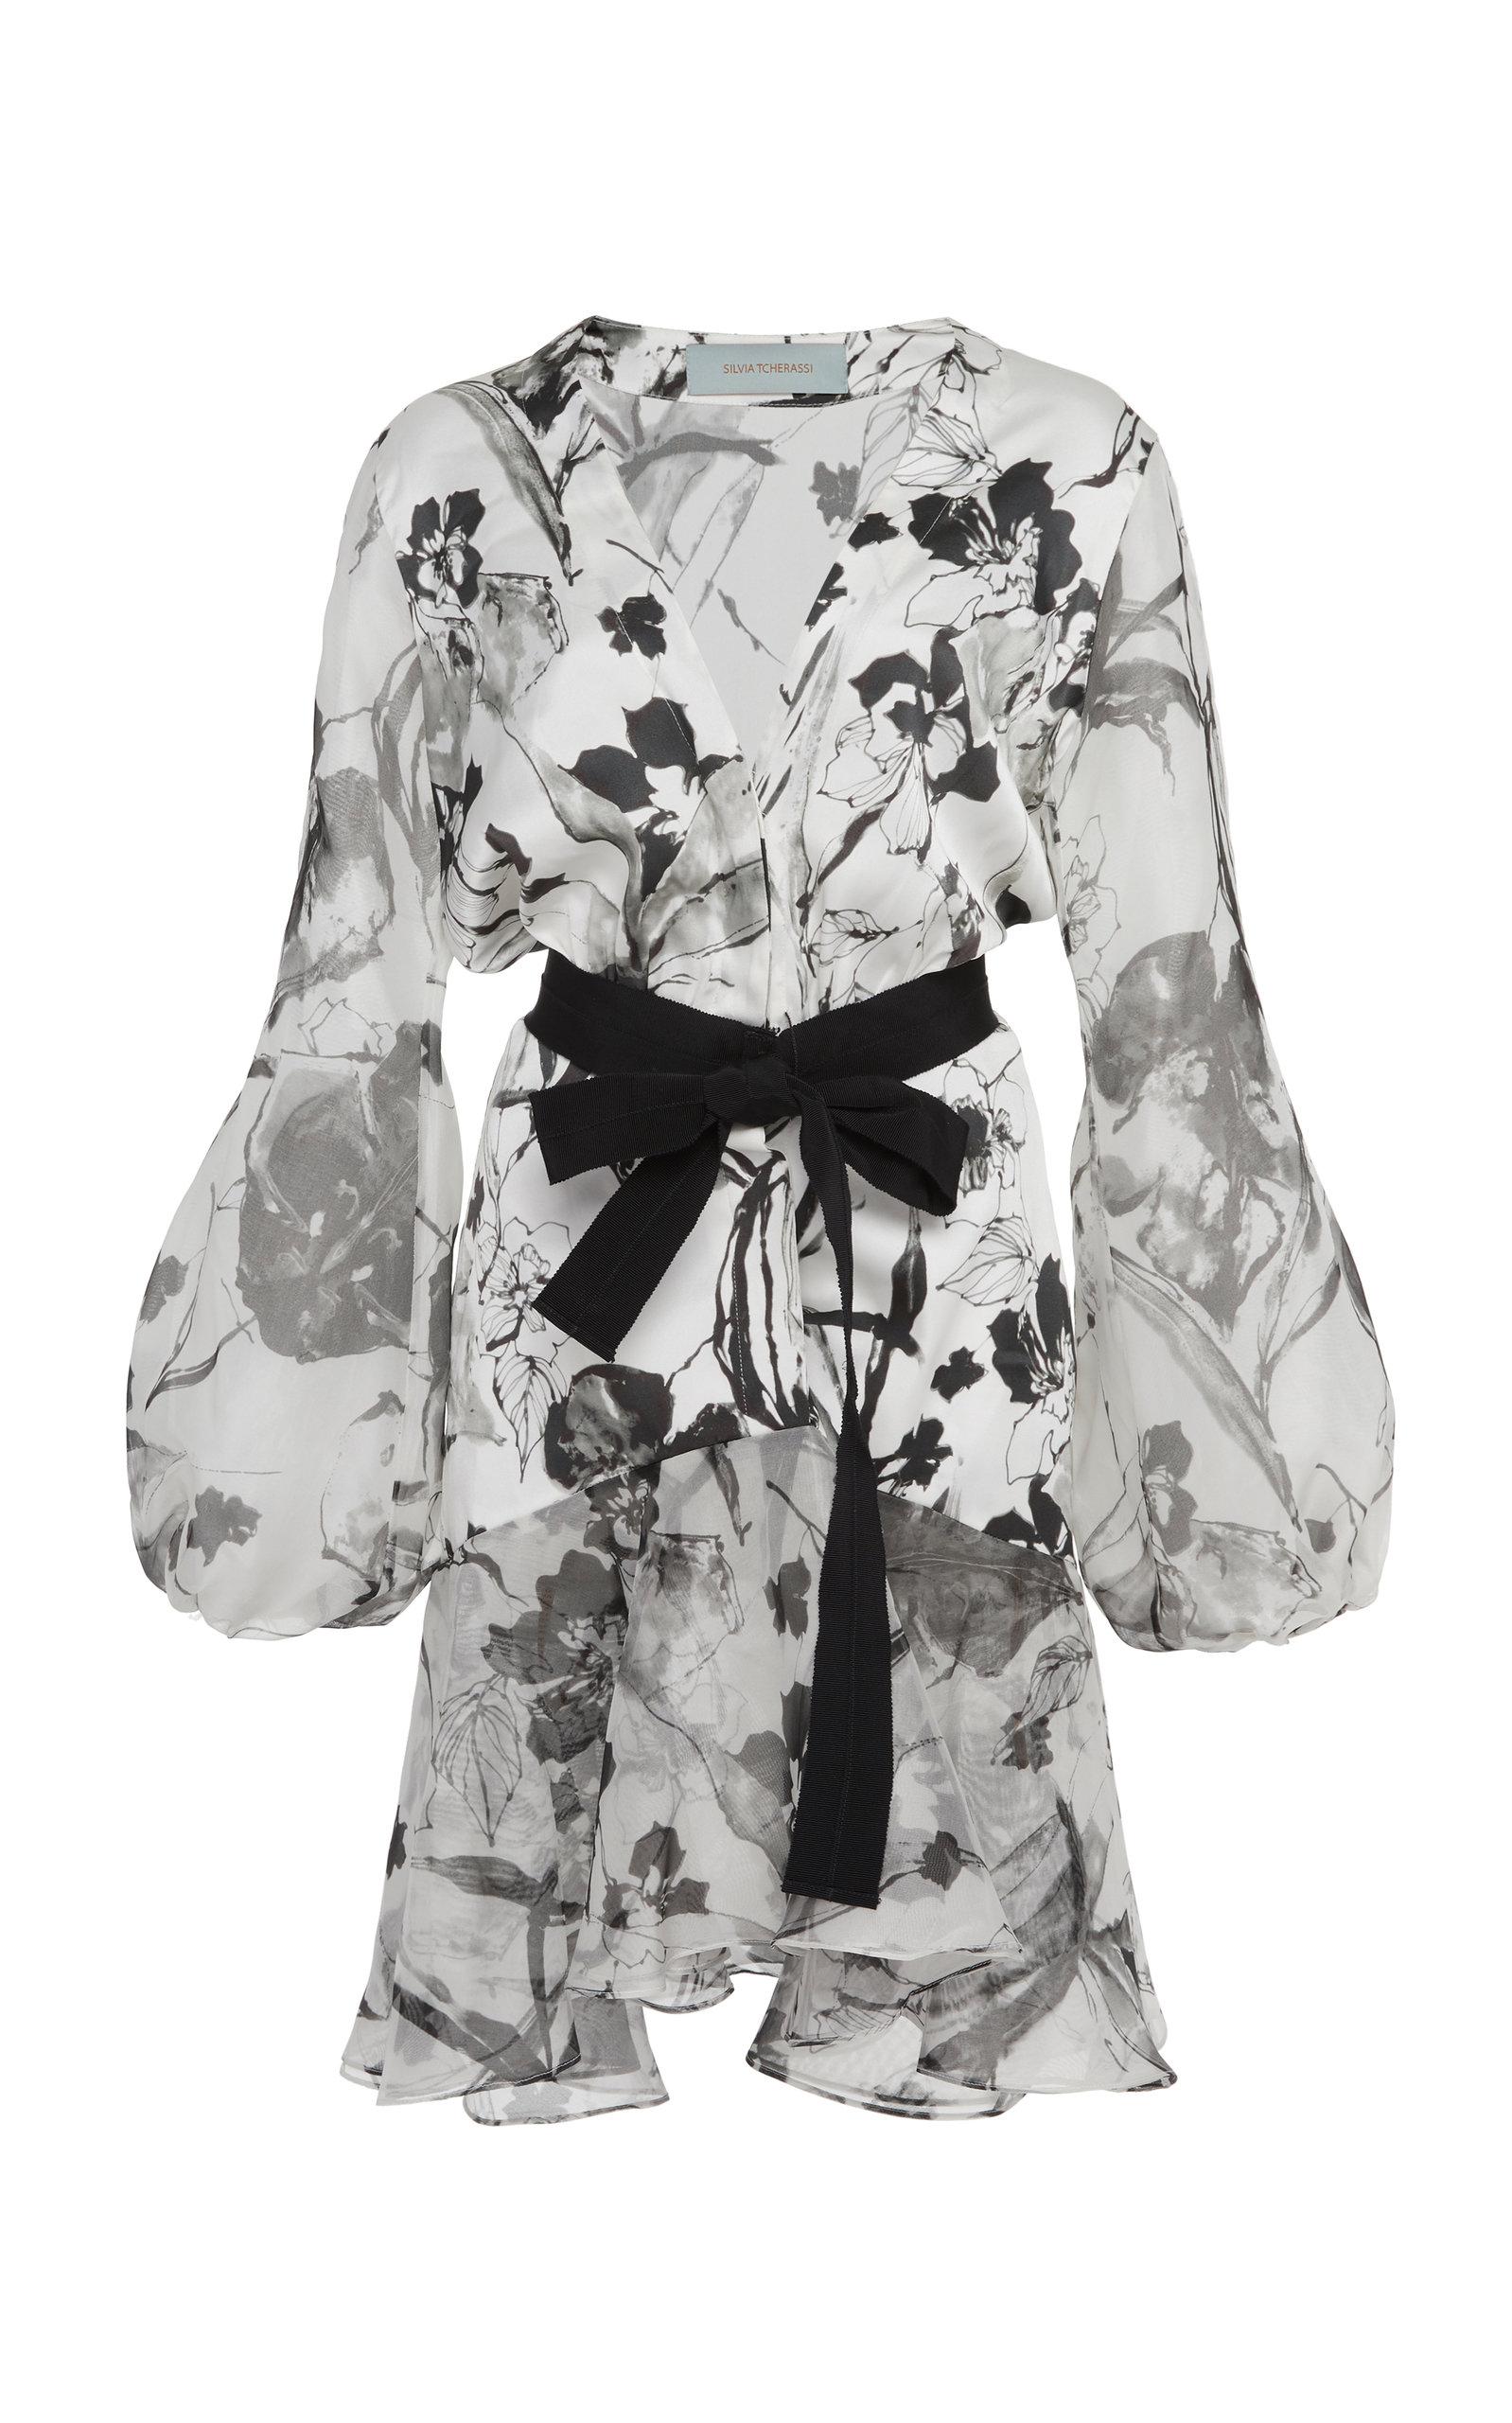 Buy Silvia Tcherassi Bow-Accented Galena Silk Mini Dress online, shop Silvia Tcherassi at the best price